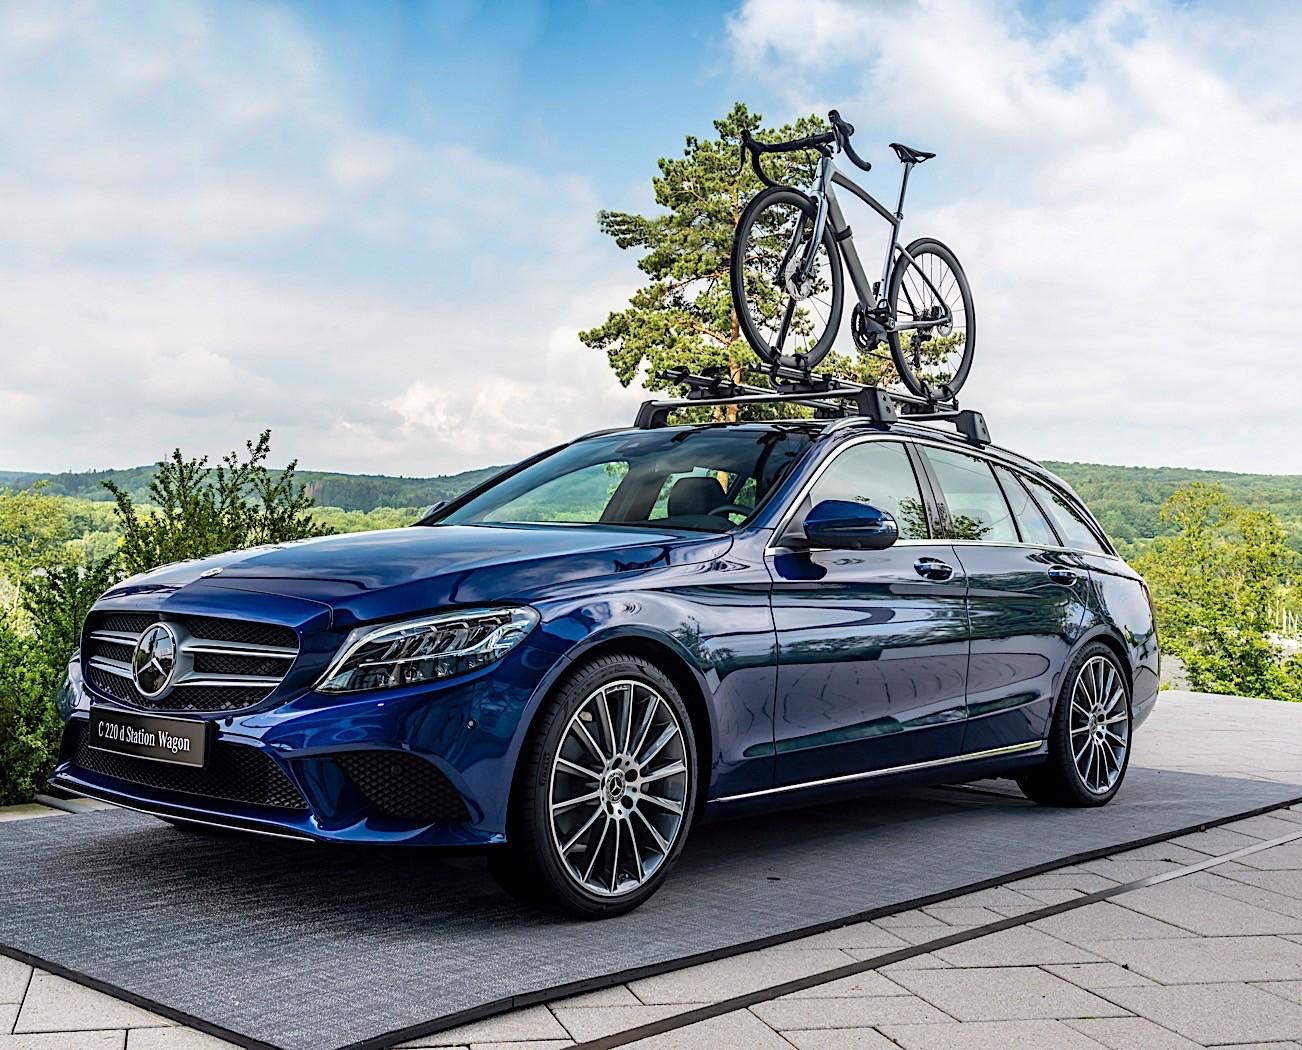 Mercedes benz unveils argon 18 road endurance bike for Mercedes benz bike